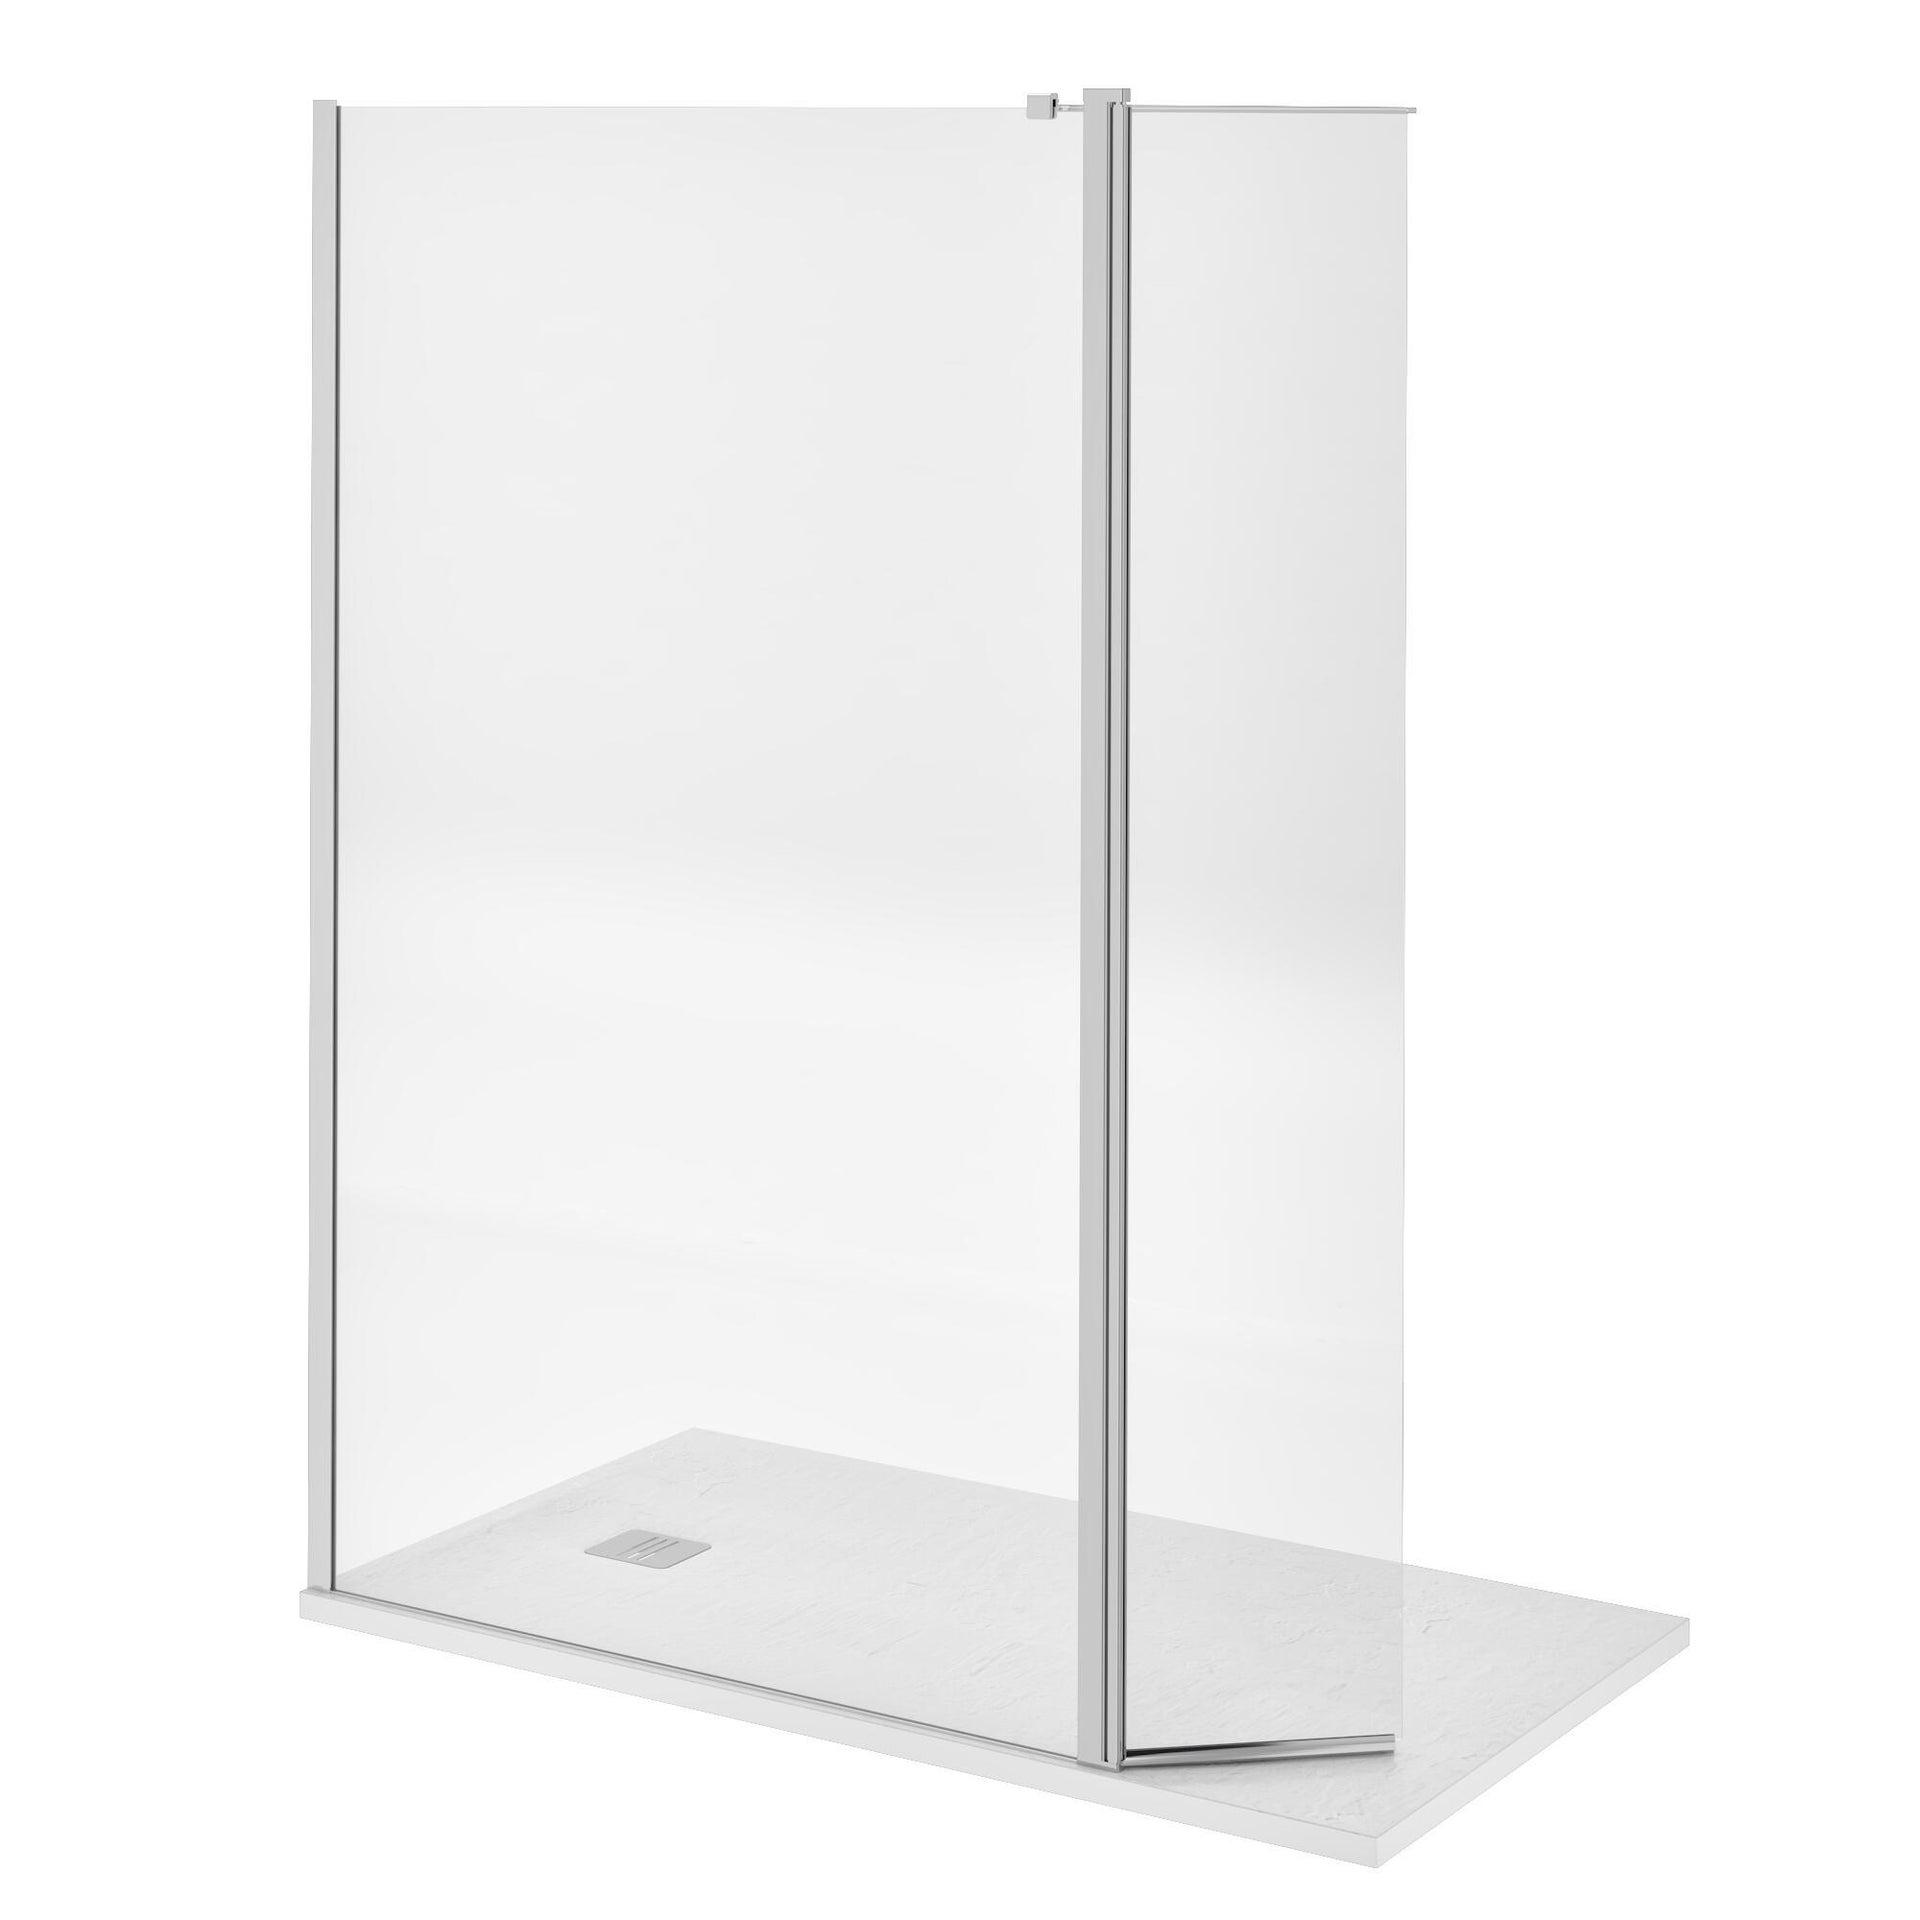 Doccia walk in L 120, H 200 cm, vetro 8 mm trasparente cromato - 14